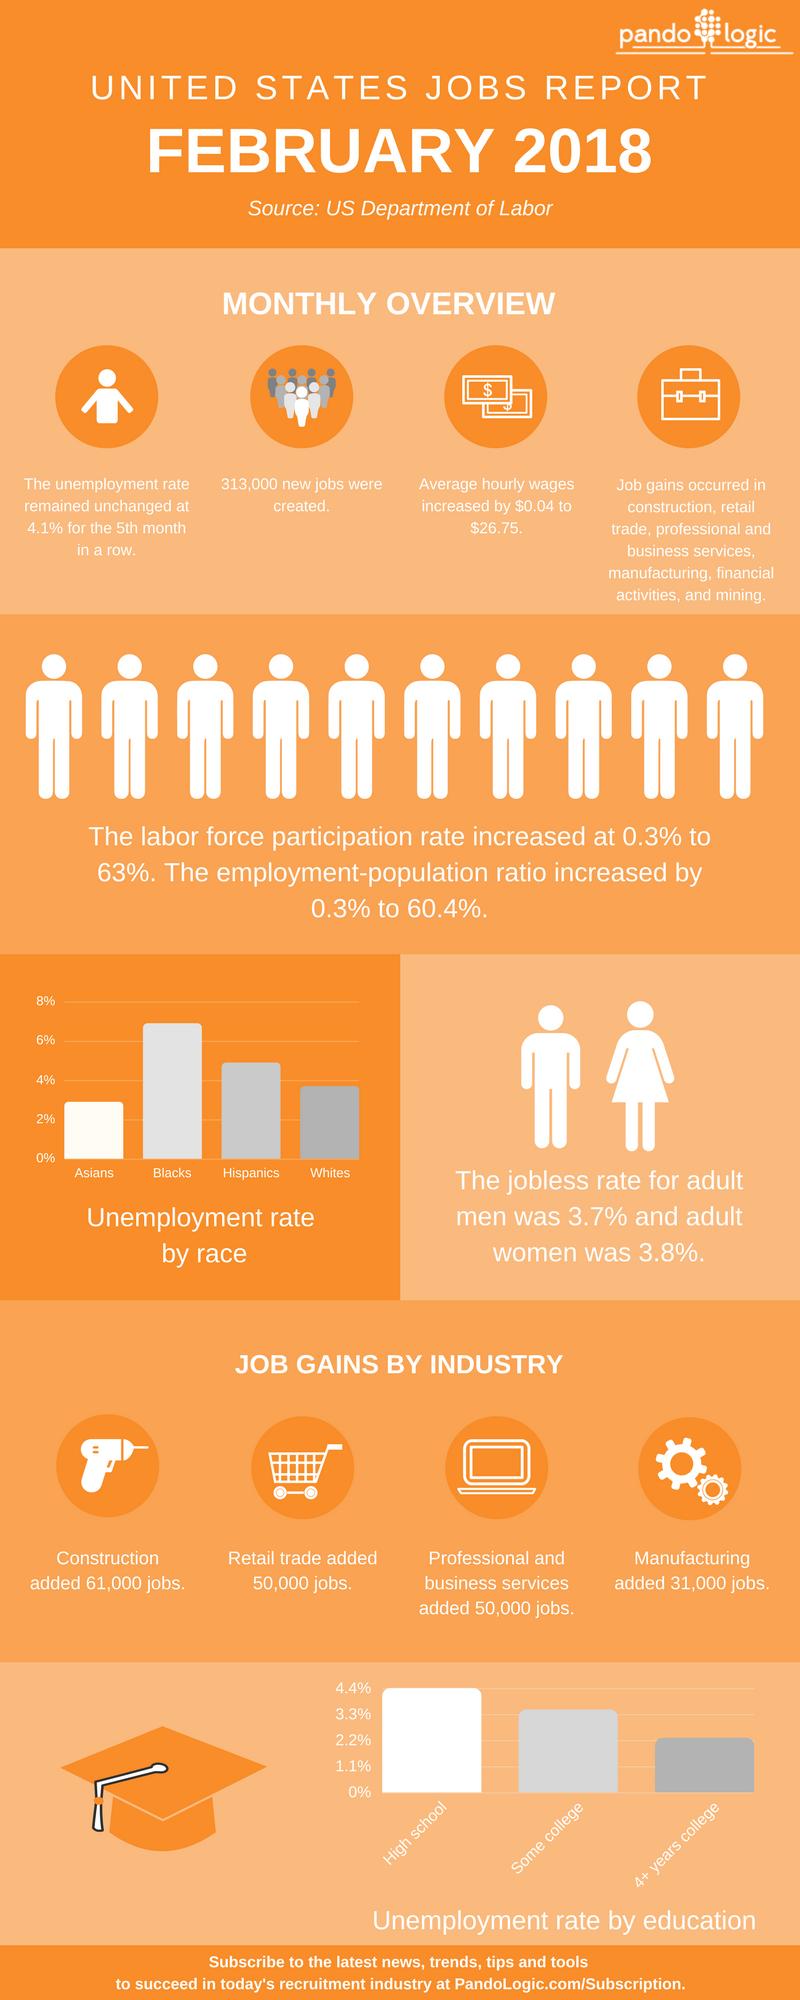 February 2018 Jobs Report